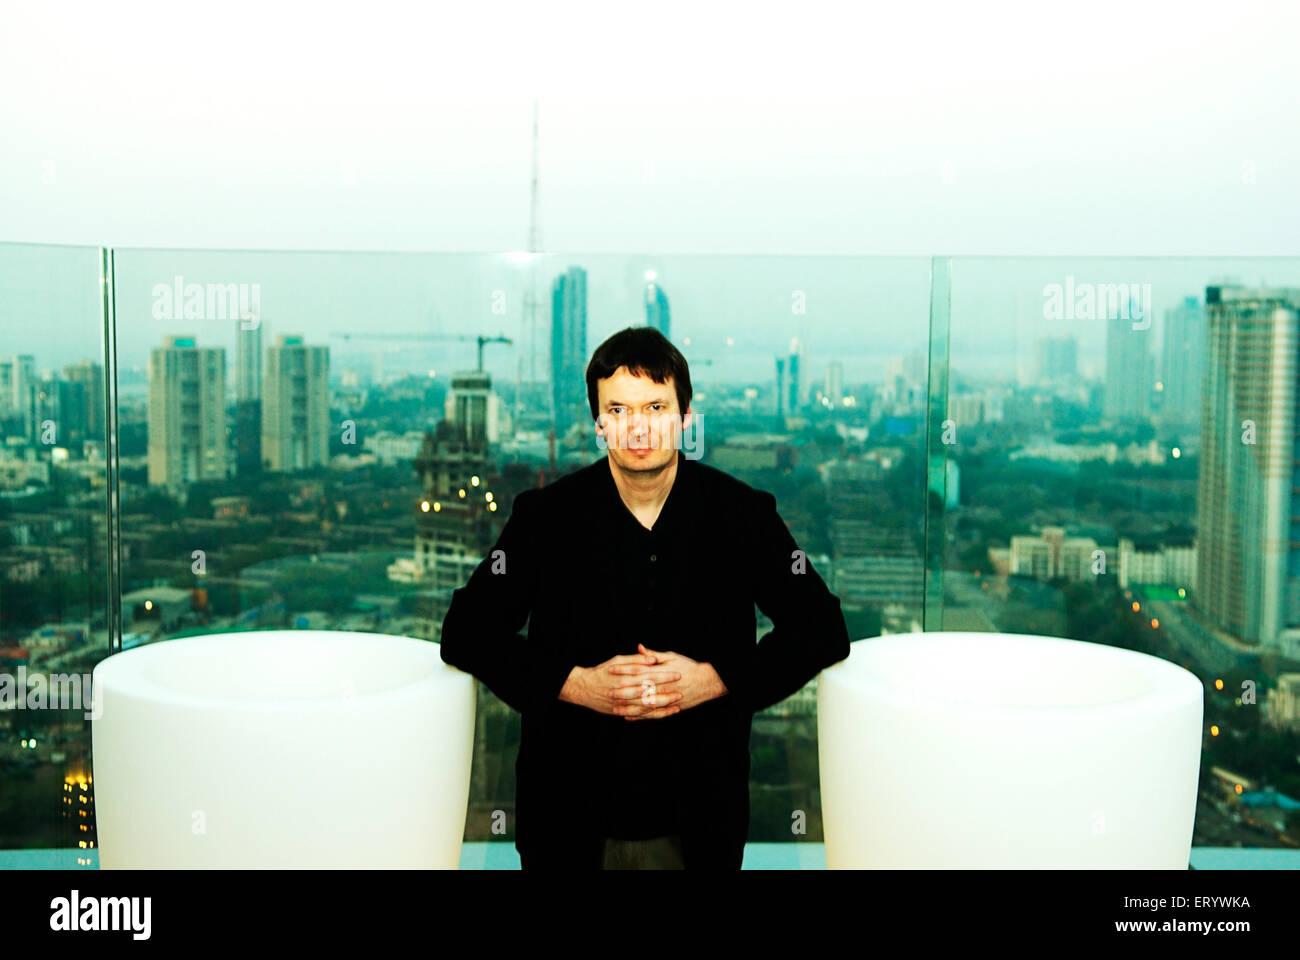 British crime fiction novelist Ian ranking NOMR - Stock Image